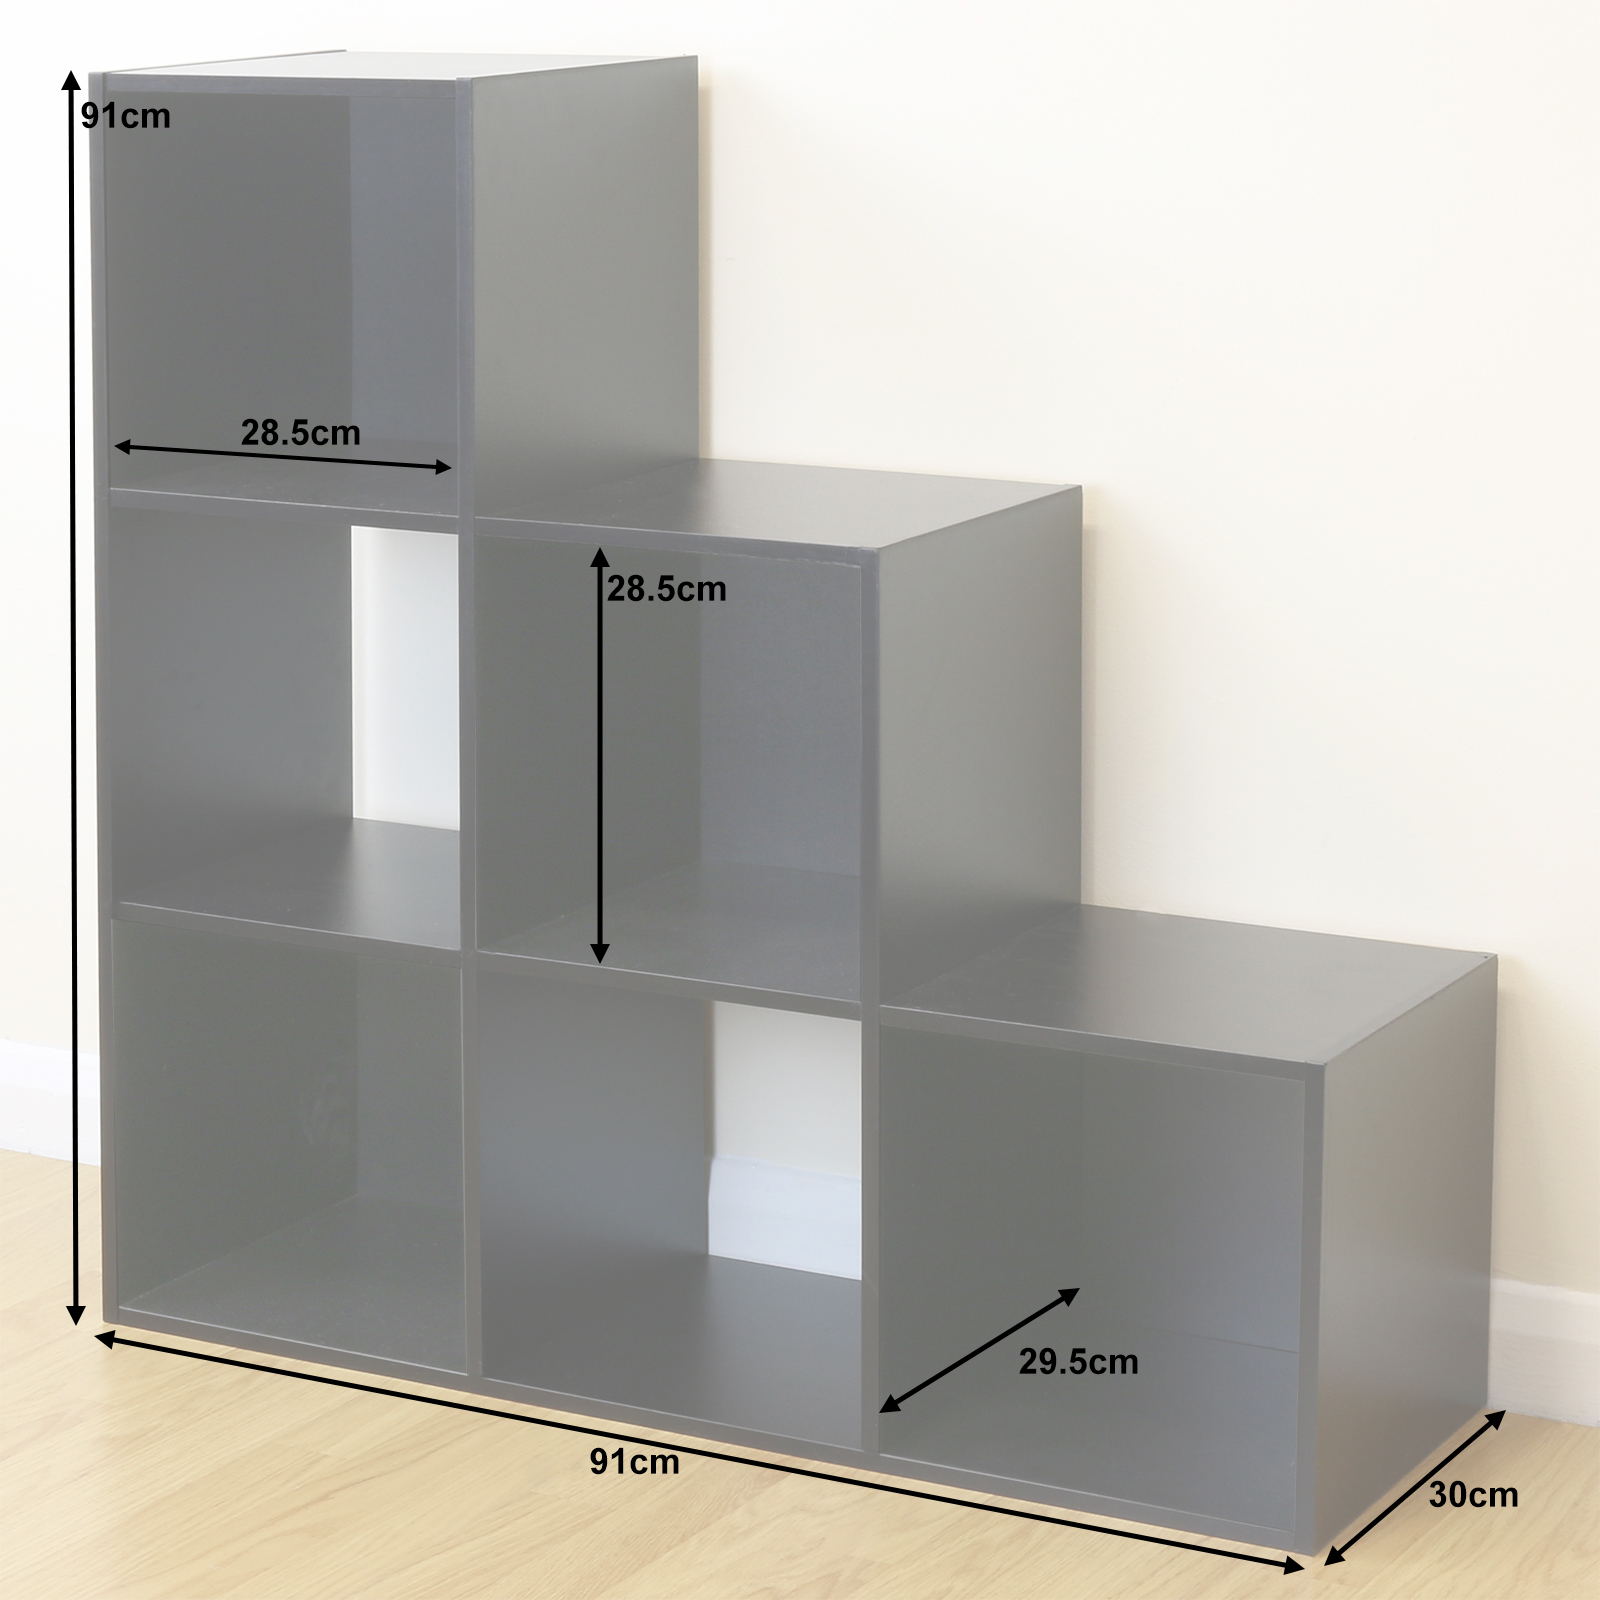 Kids Storage Cube Organizer Toy Box Kids Bedroom Furniture: 6 Cube Kids Black Toy/Games Storage Unit Girls/Boys/Childs